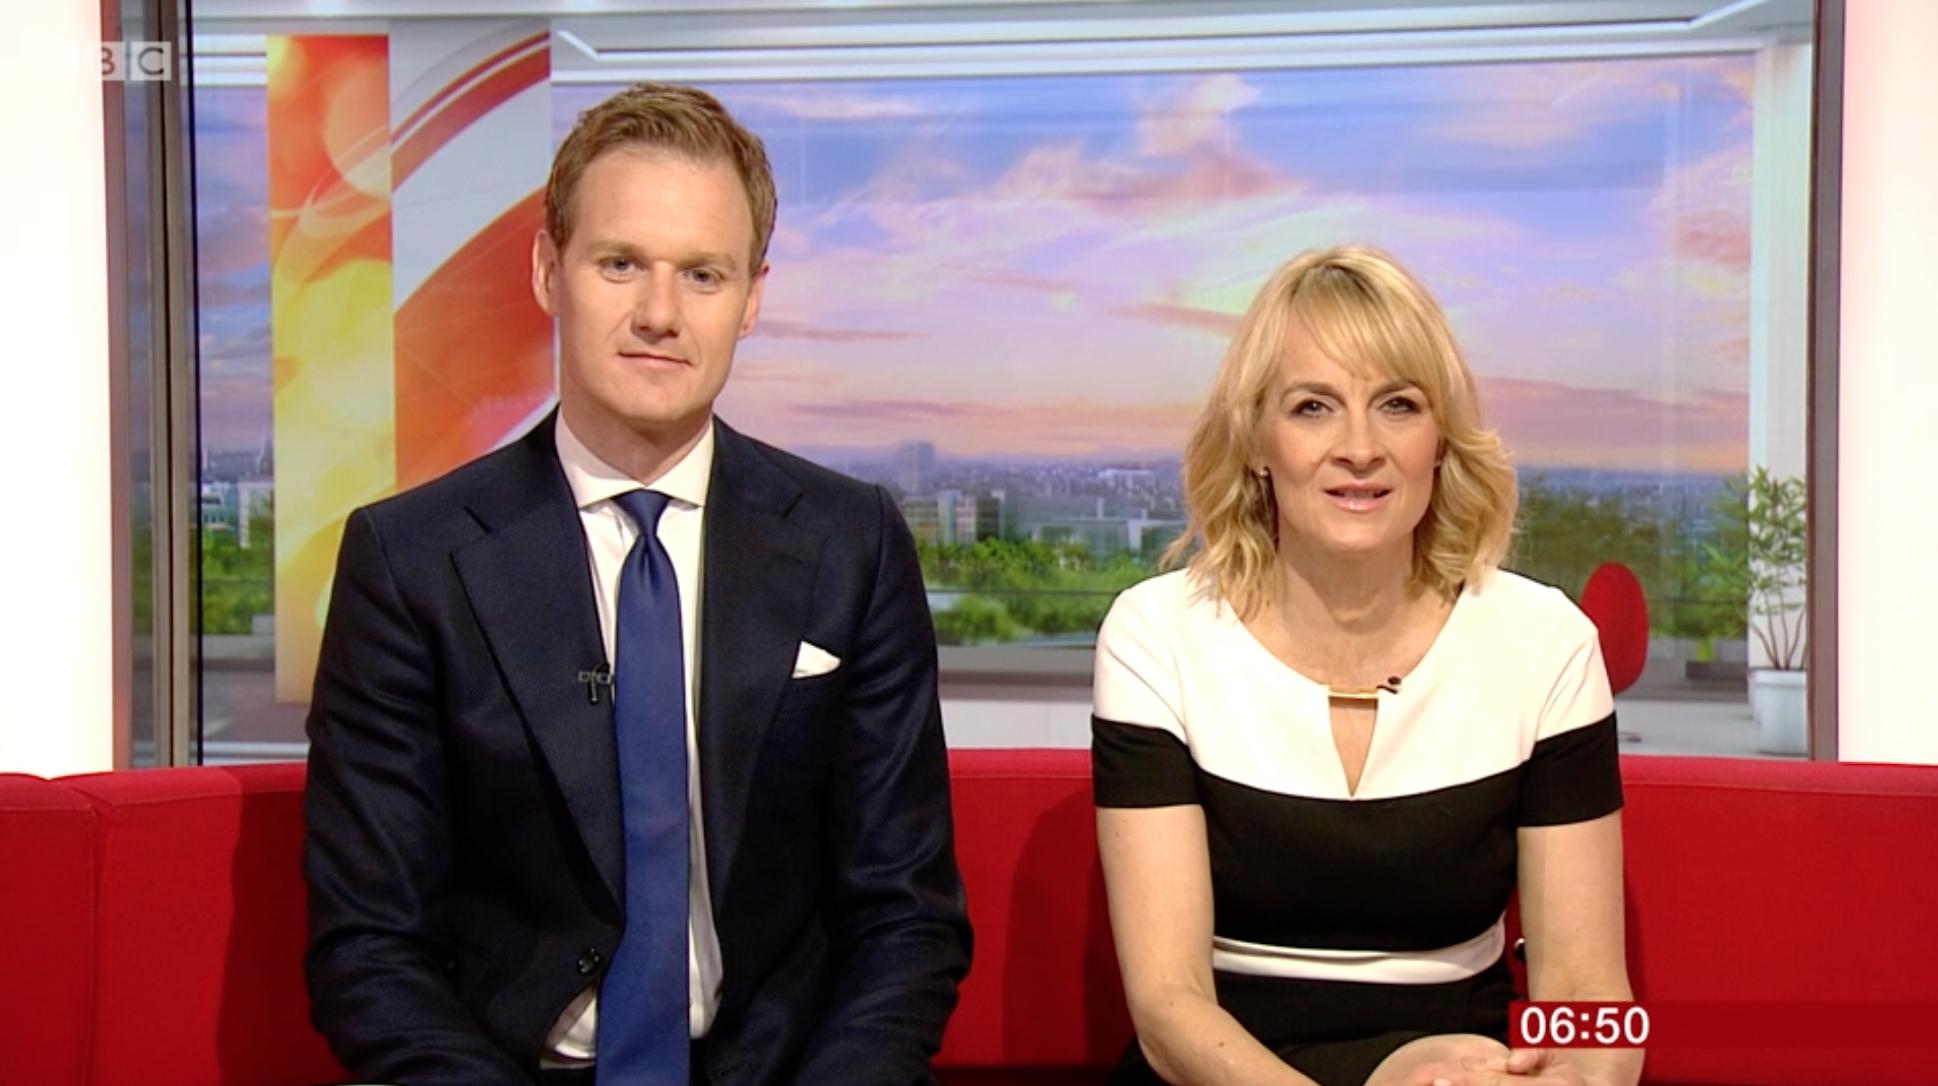 BBC Breakfast viewers repulsed by 'fatberg' segment